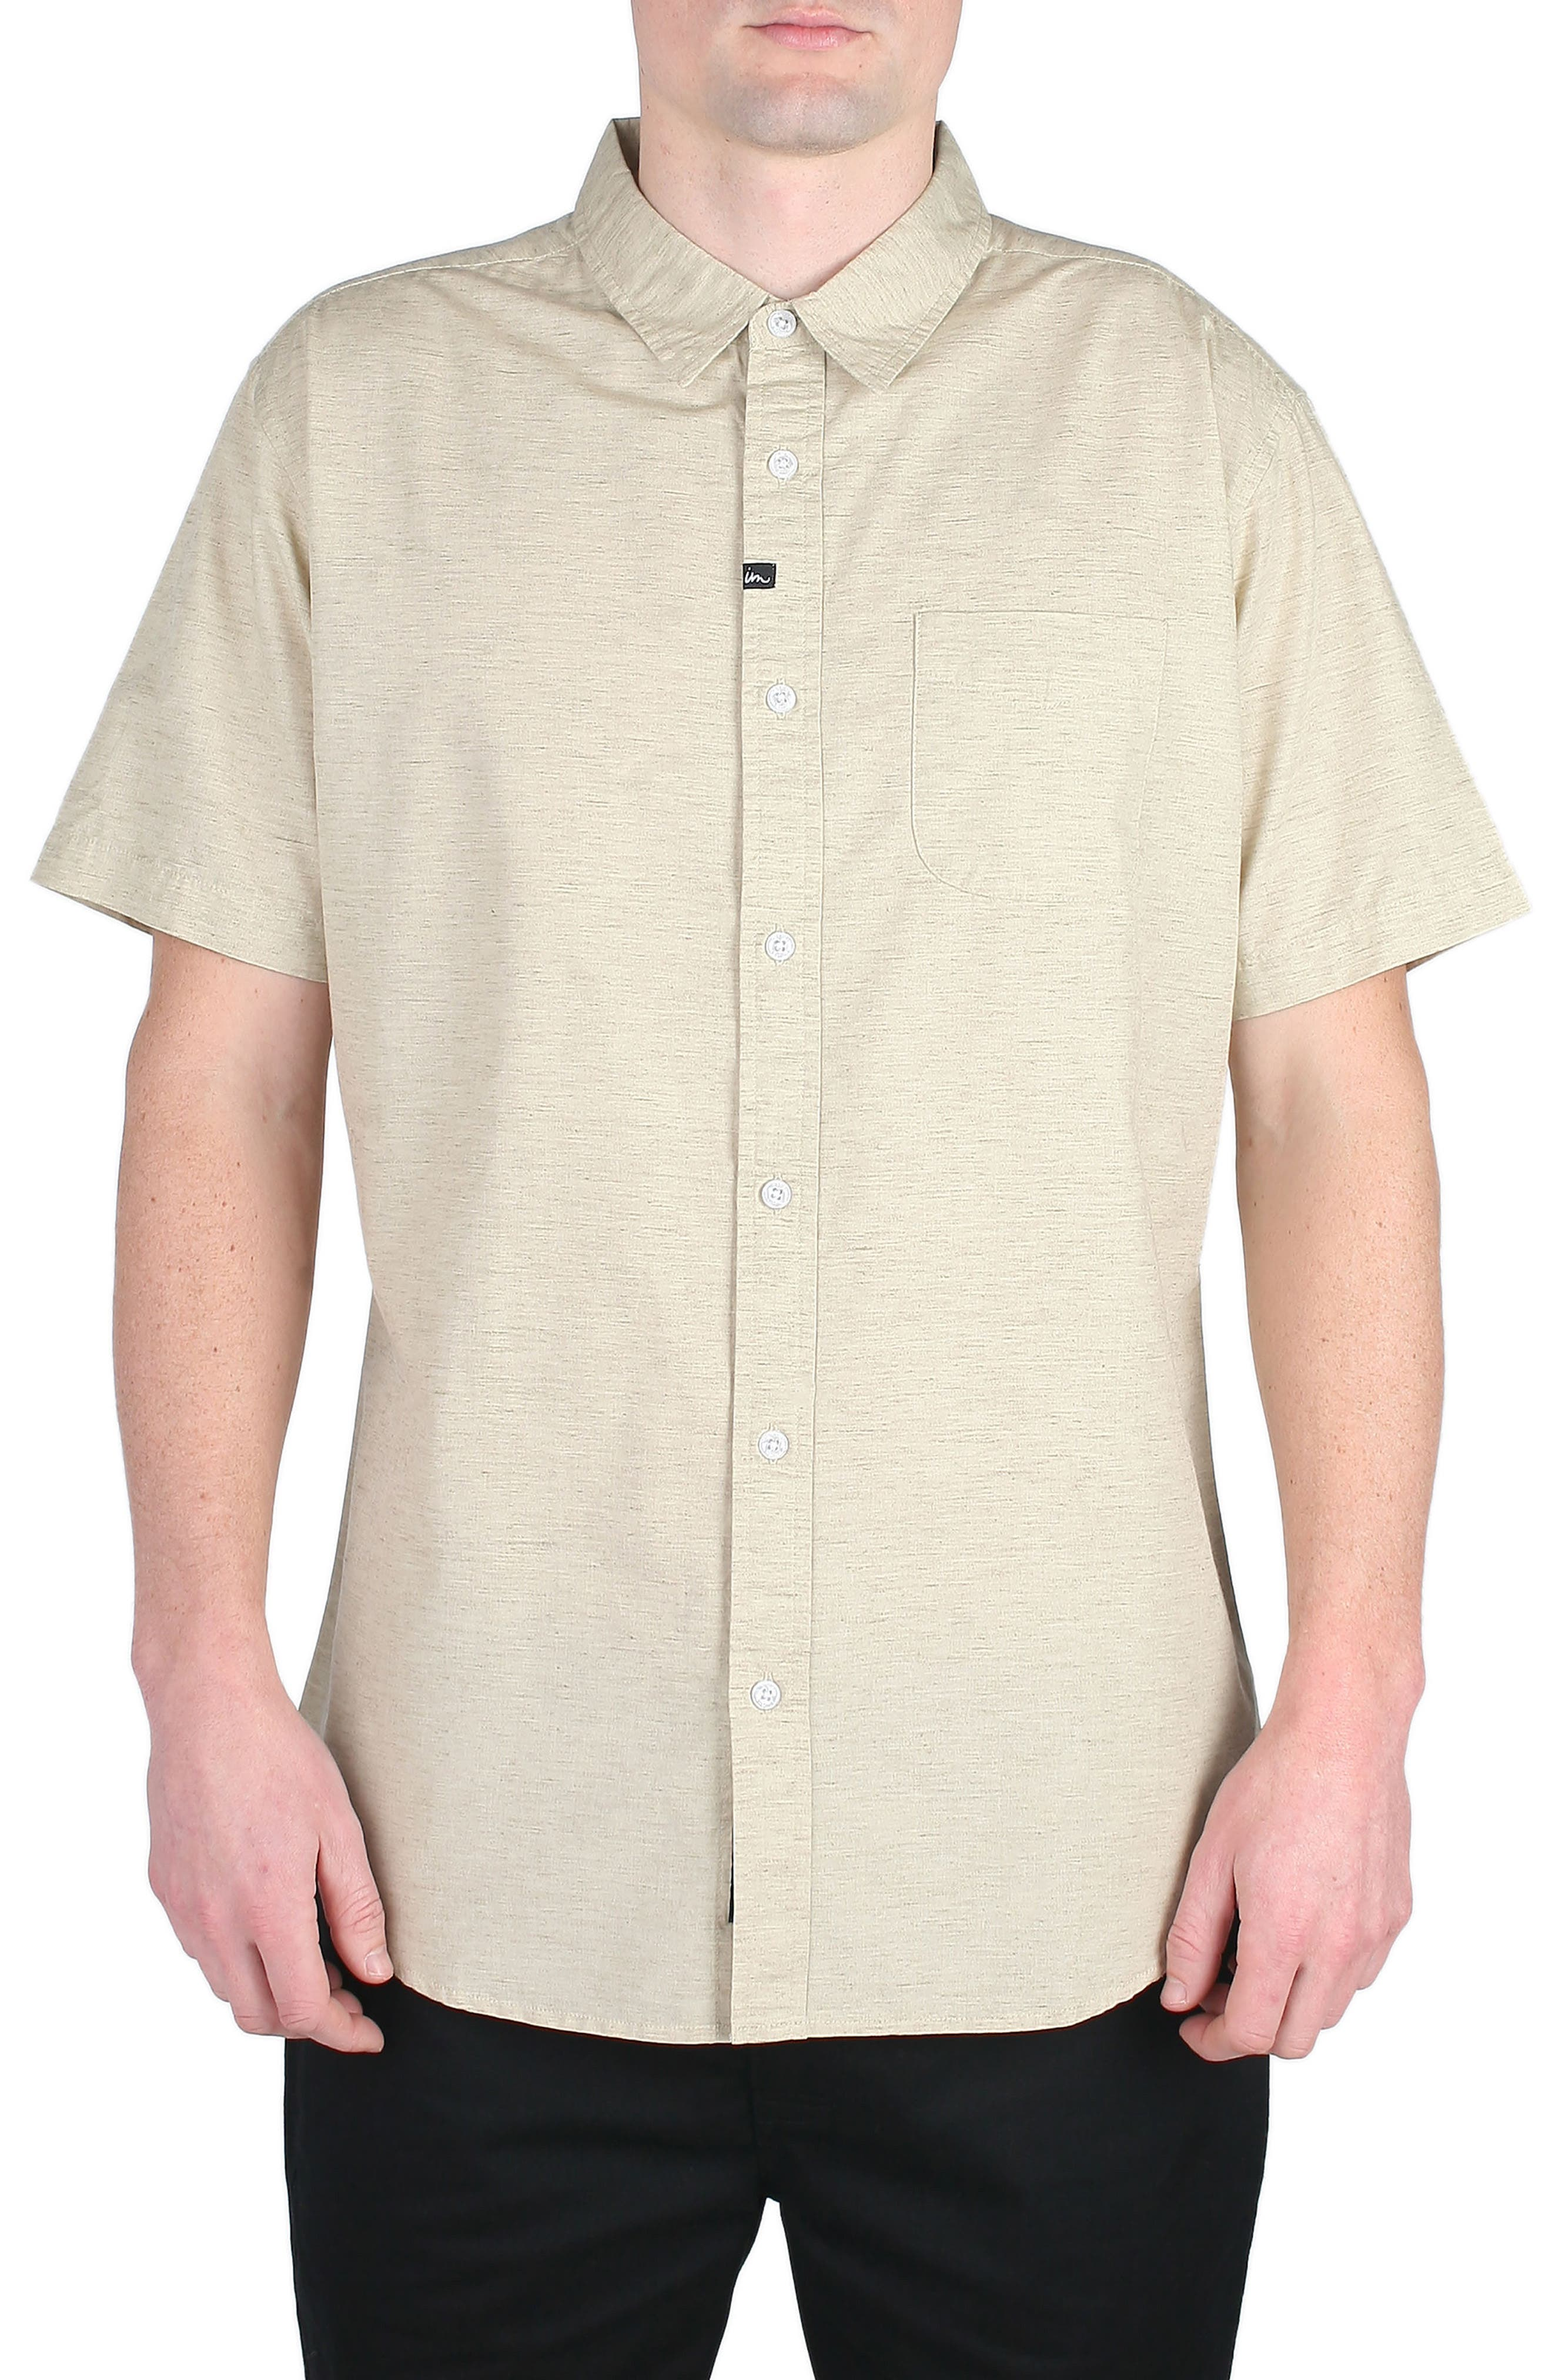 Triumph Woven Shirt,                             Main thumbnail 1, color,                             250